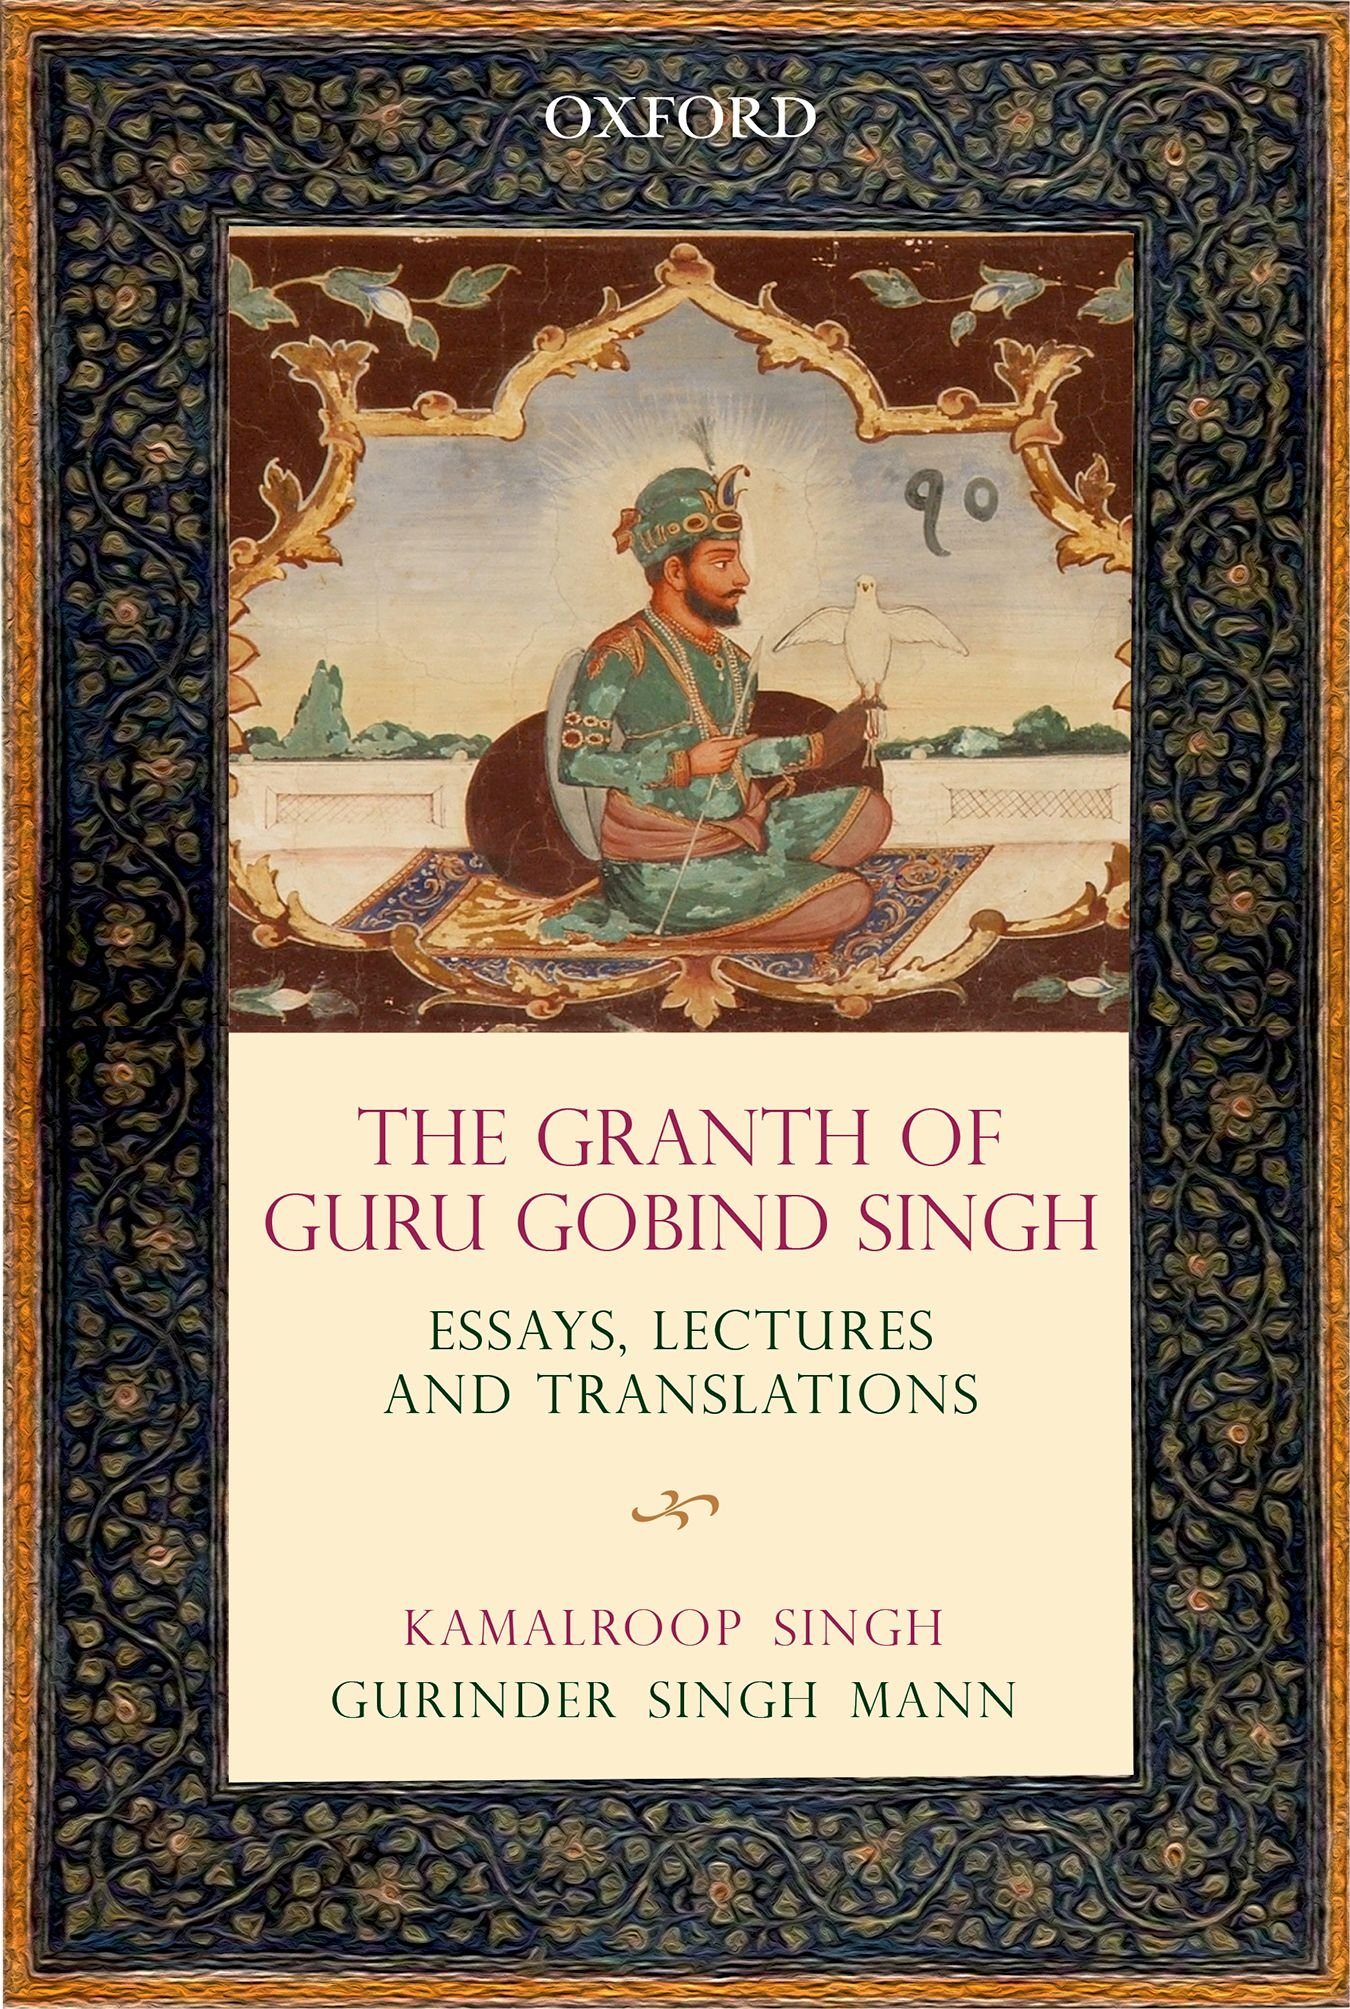 The Granth of Guru Gobind Singh